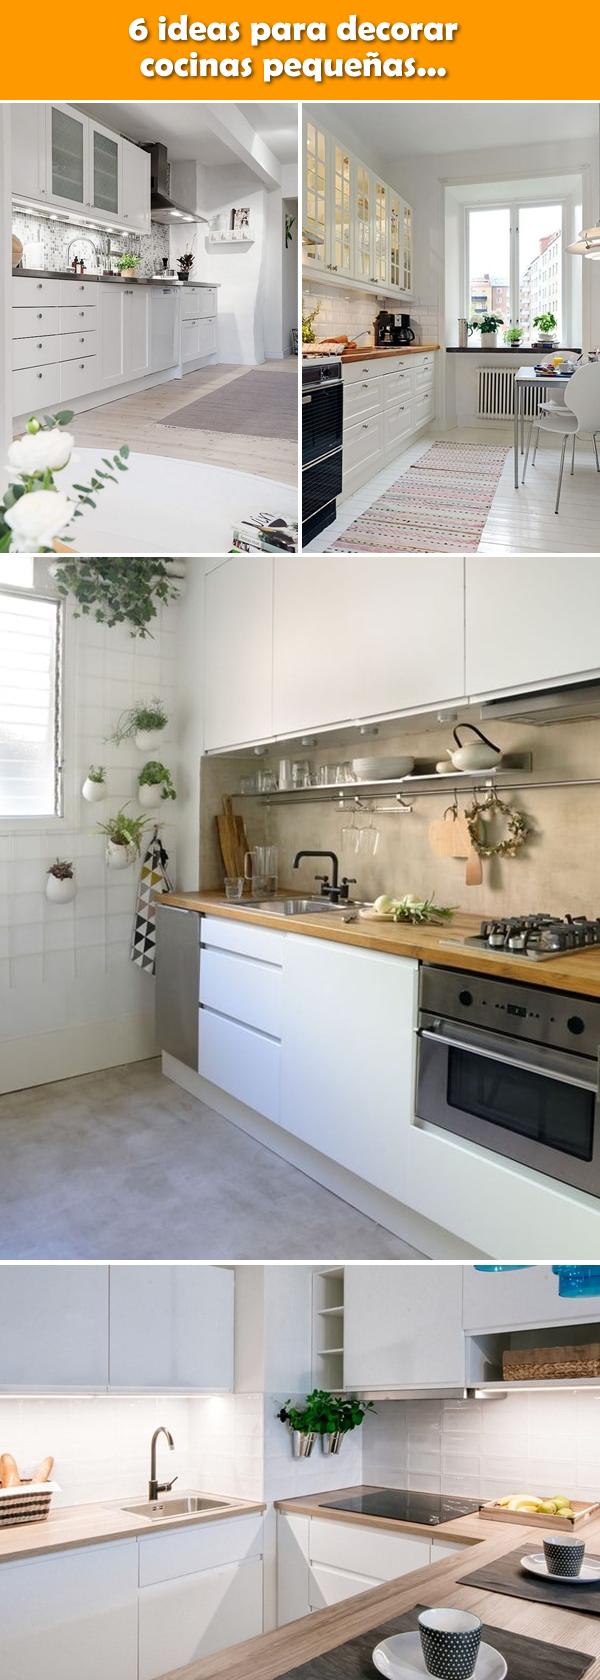 Cocinas peque as 6 ideas para decorarlas cocinas - Ideas para decorar cocinas pequenas ...